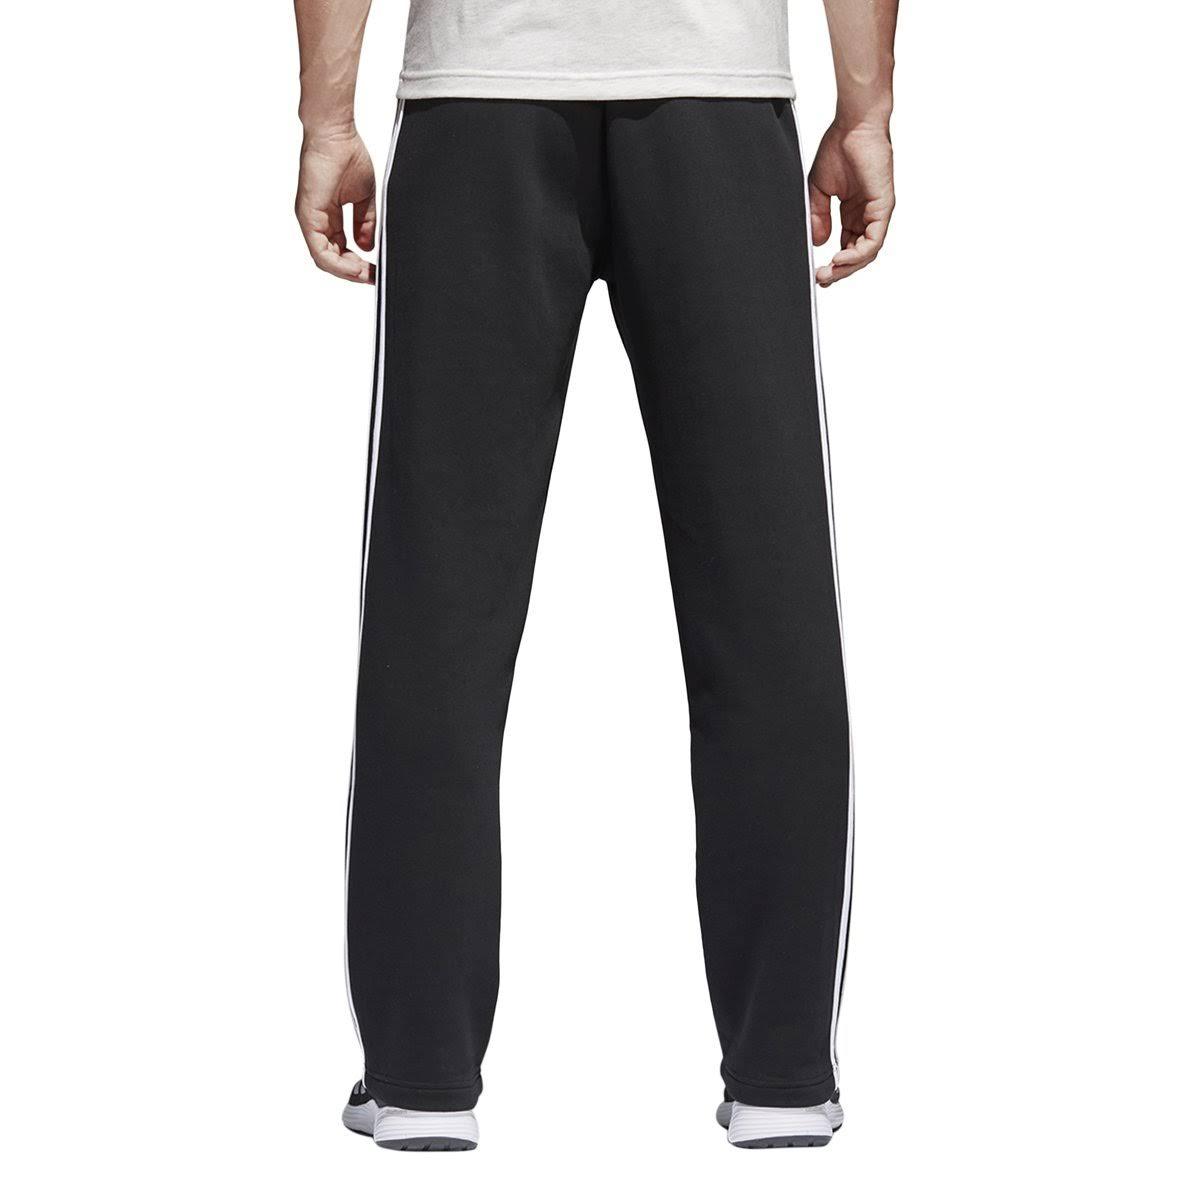 Men's fleece Streifen Essentials Adidas hose Passform Normaler Mit 3 aIUdqx7